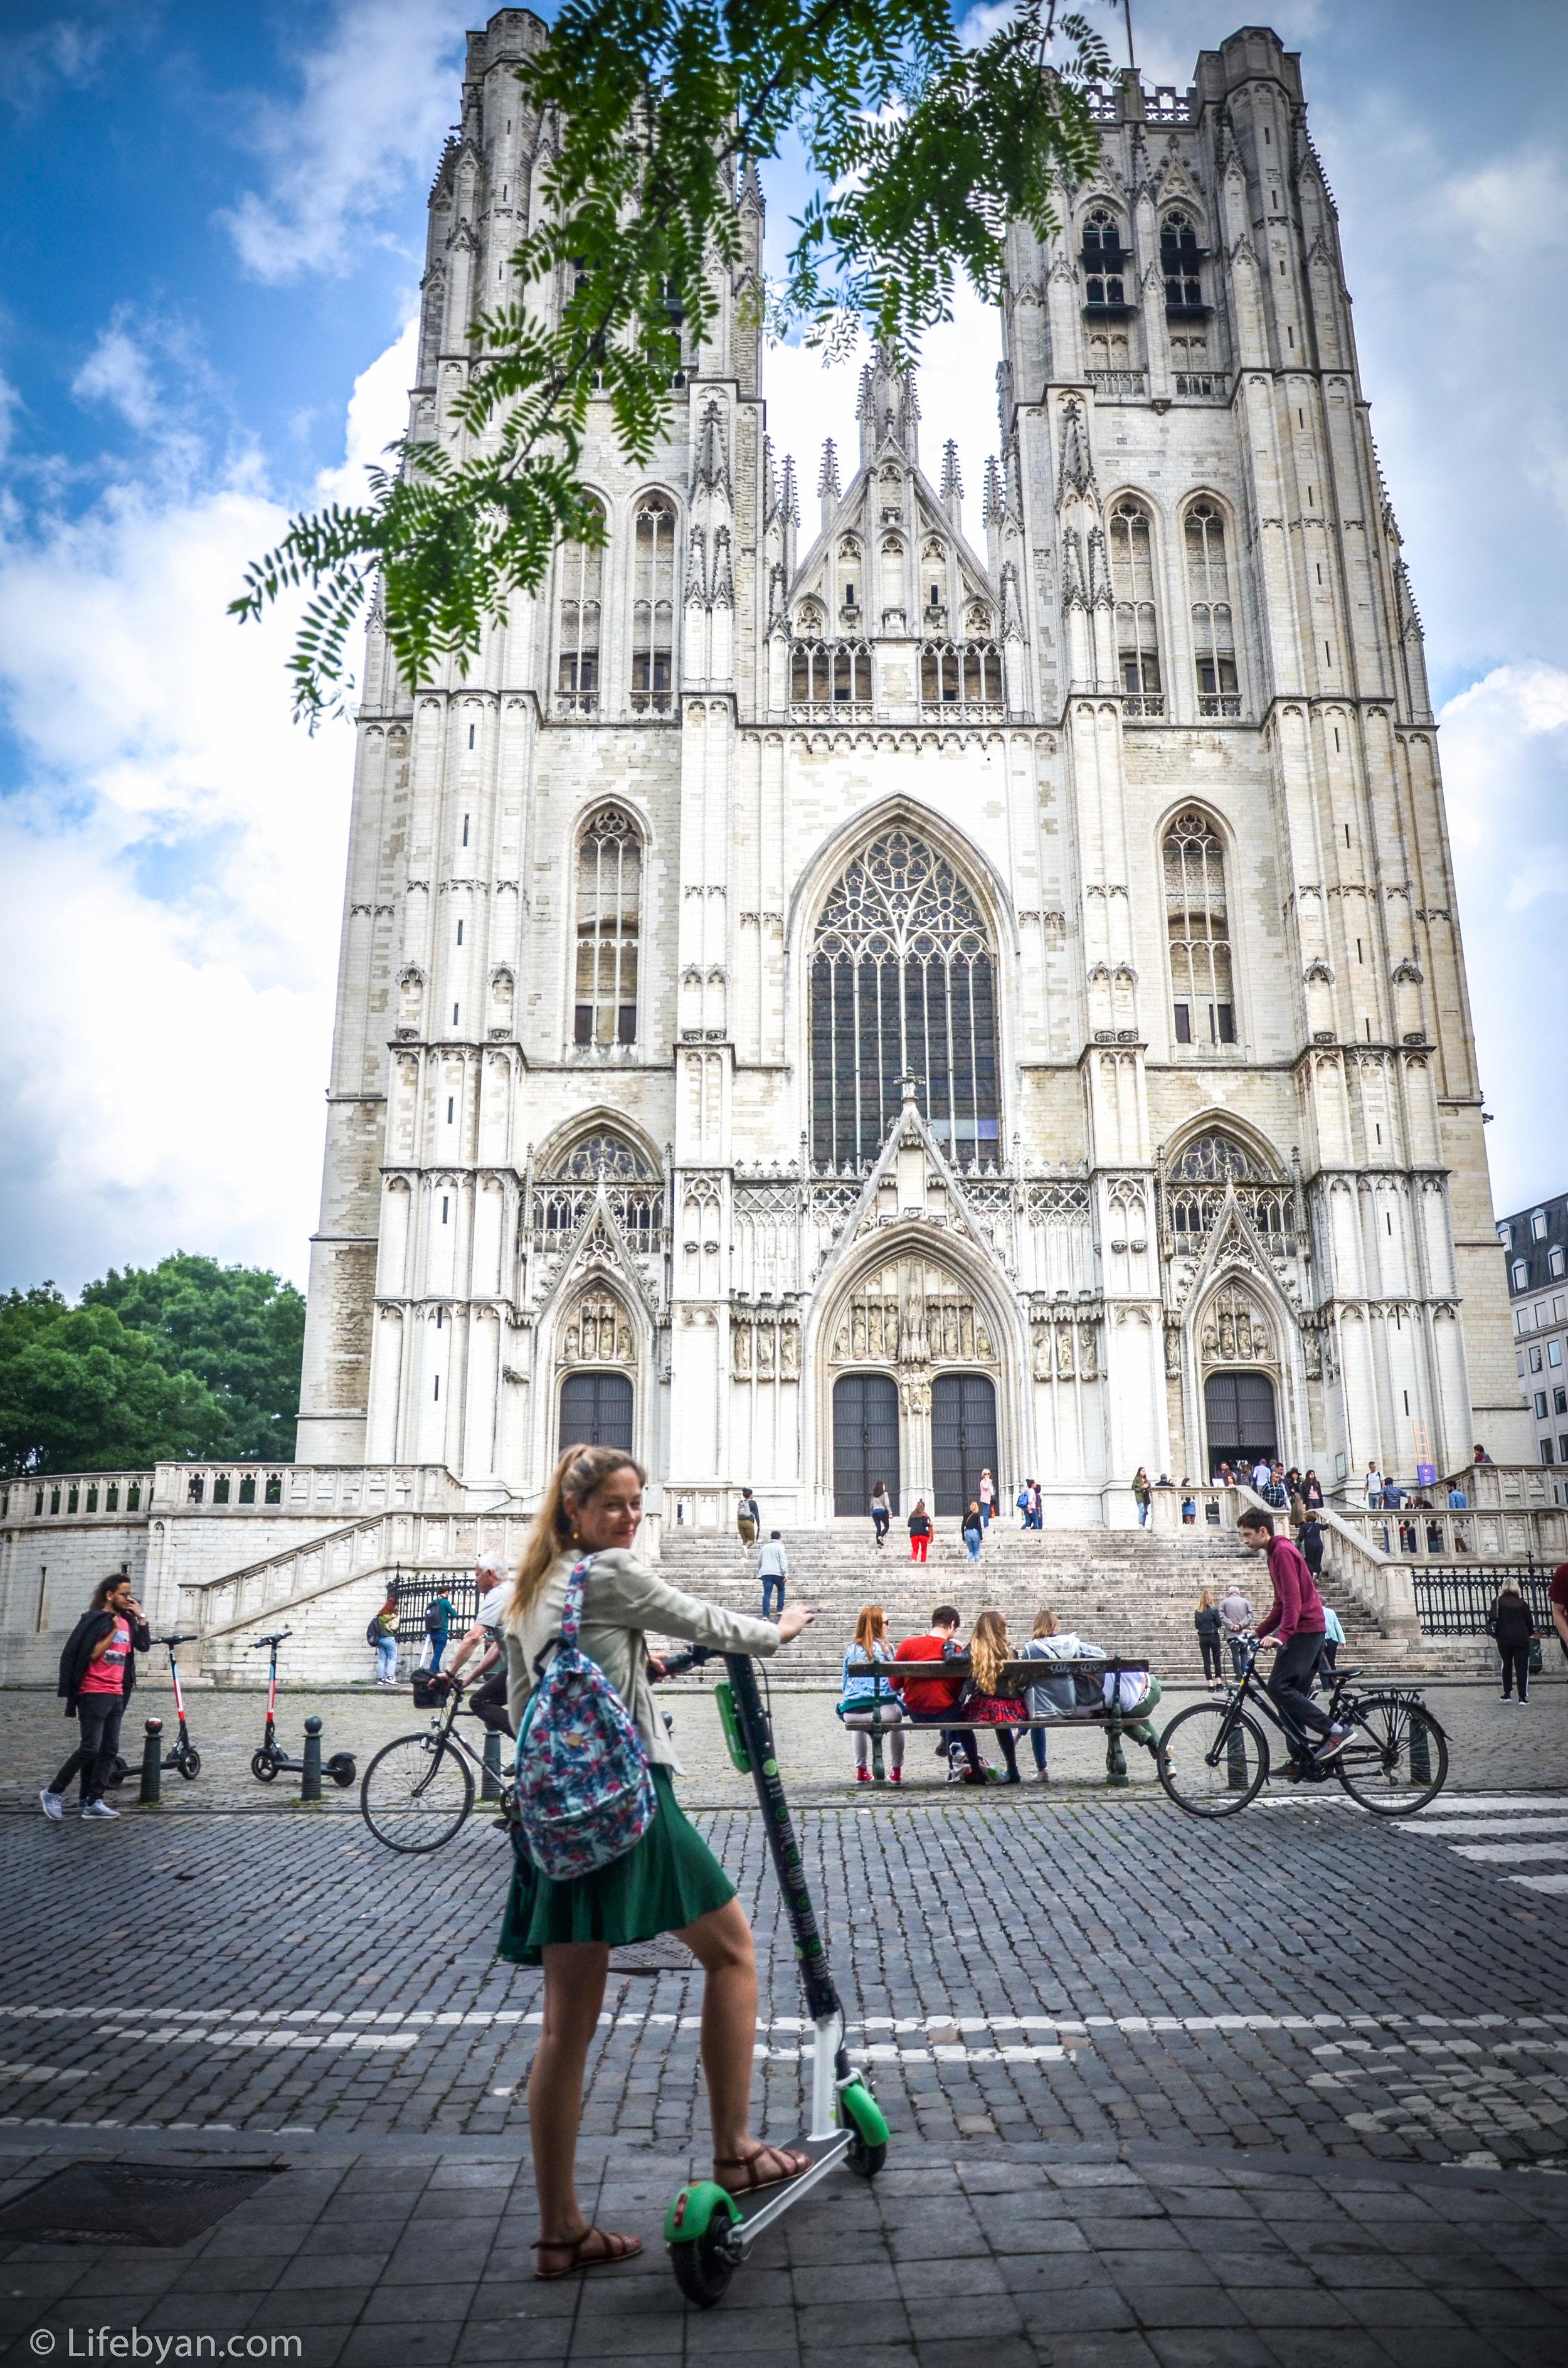 Je kan deze toffe steps huren om Brussel mee te verkennen. Cool toch?